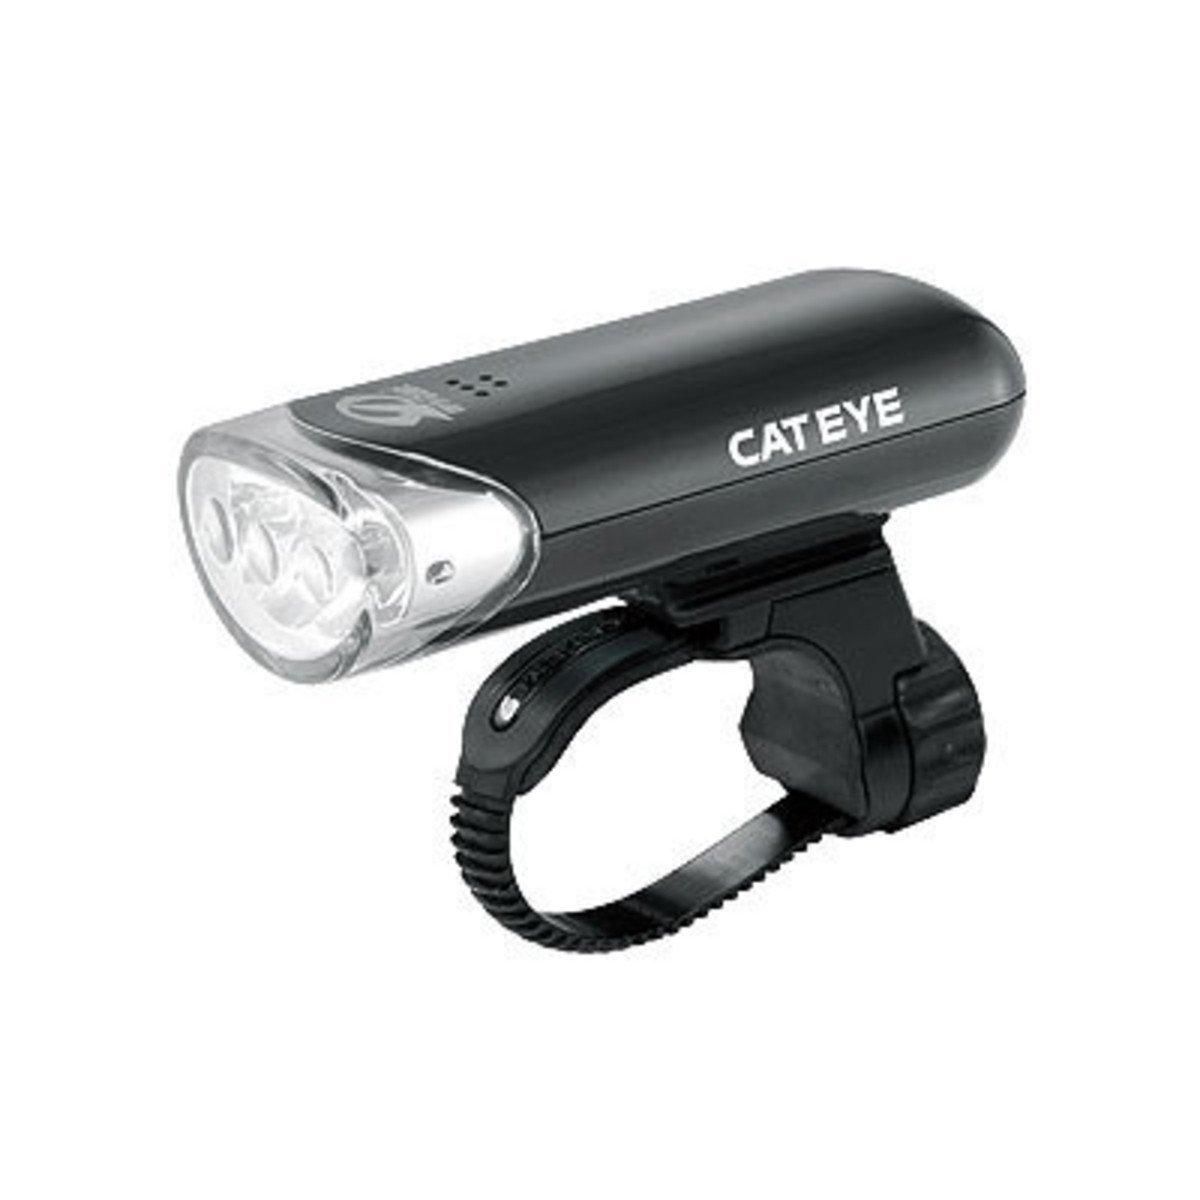 - HL-EL135 Headlight, HLEL140 Waterproof Taillight Front Go Mount Volt Store Combo Black Headlight Rechargeable Helmet Lights Light Battery.., By CatEye